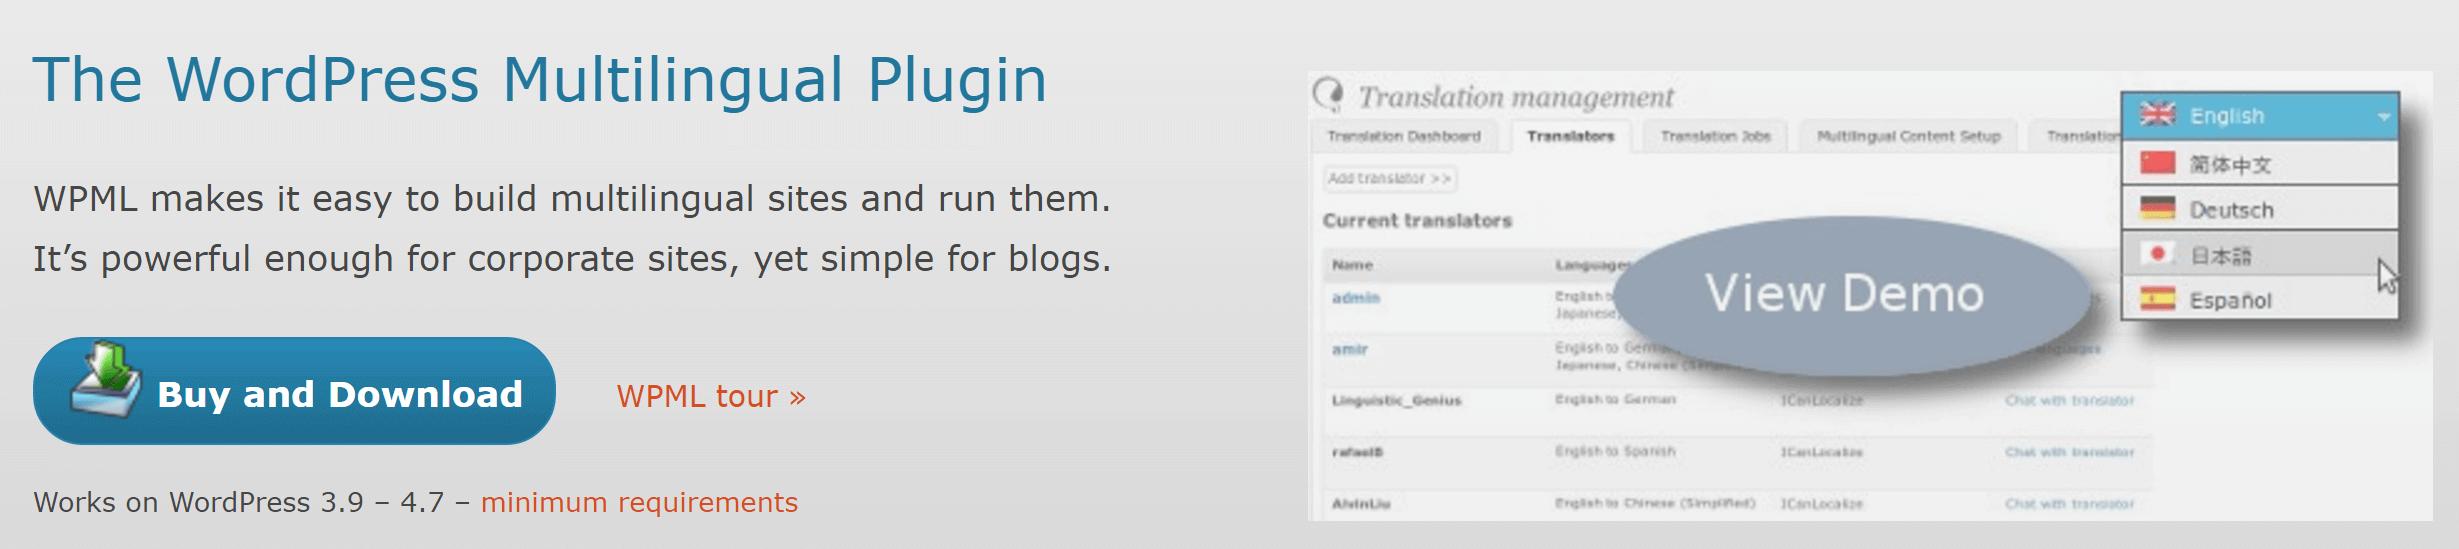 The WPML plugin.